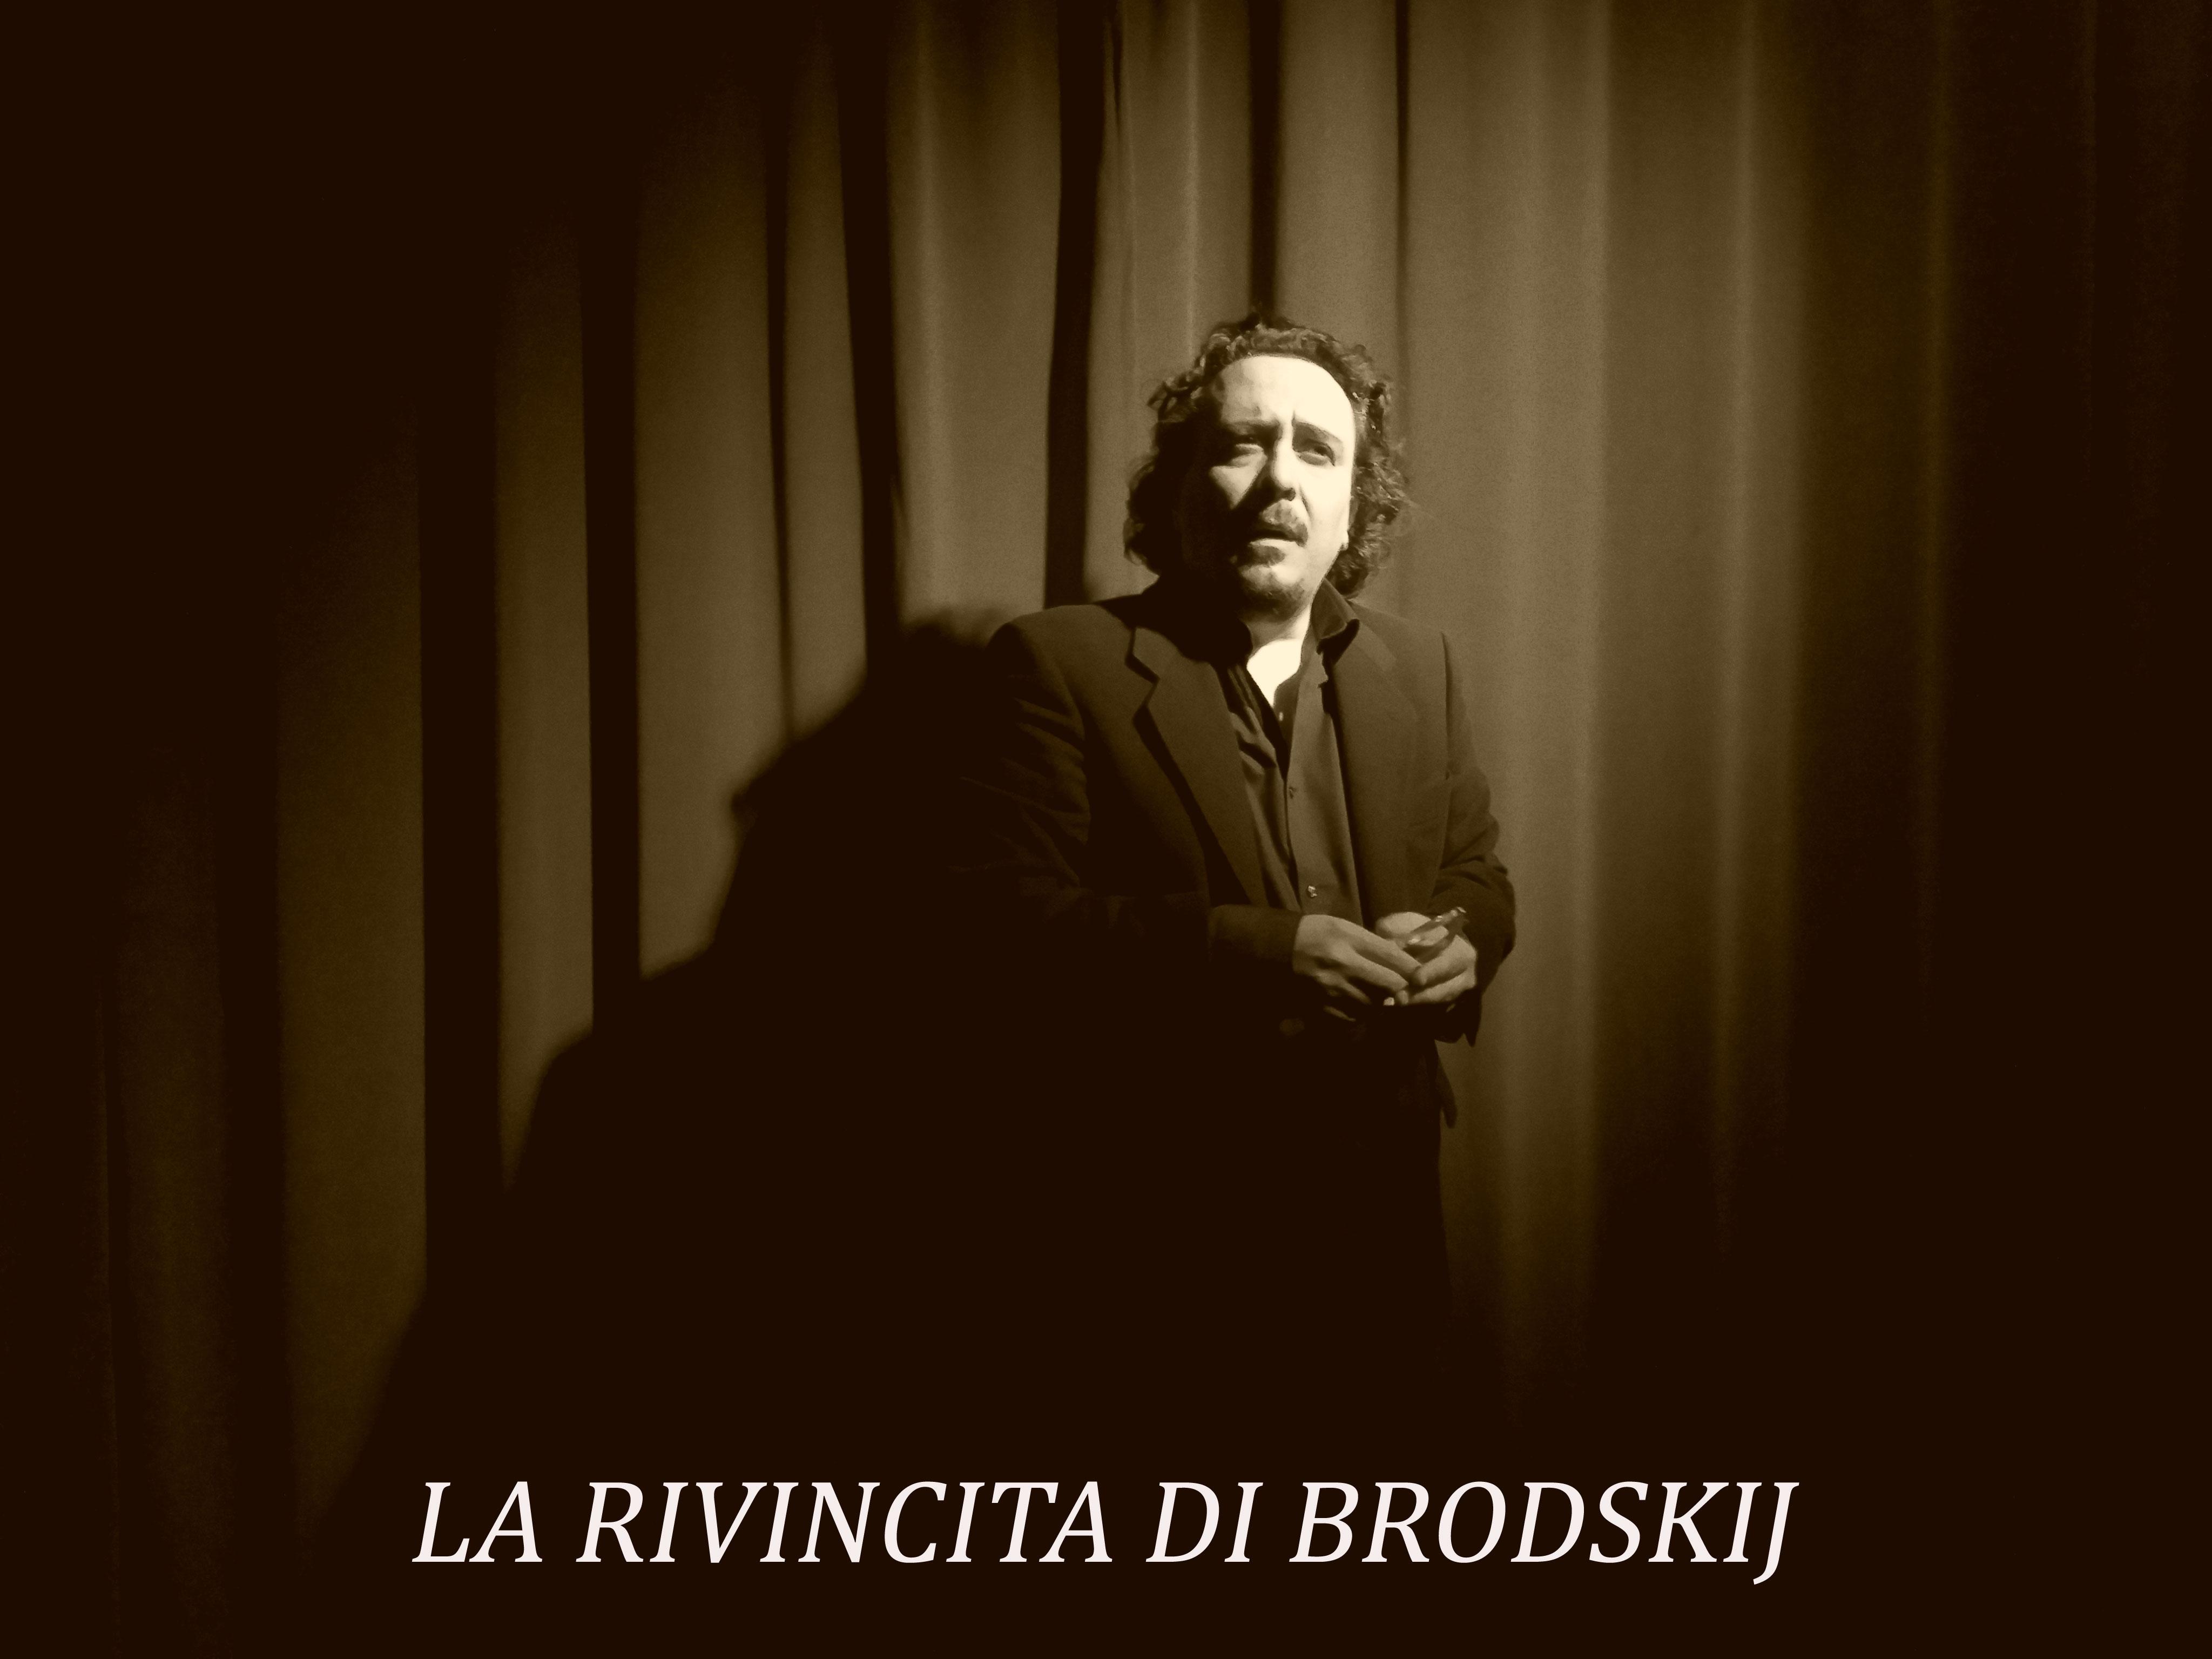 LA-RIVINCITA-DI-BROD-3